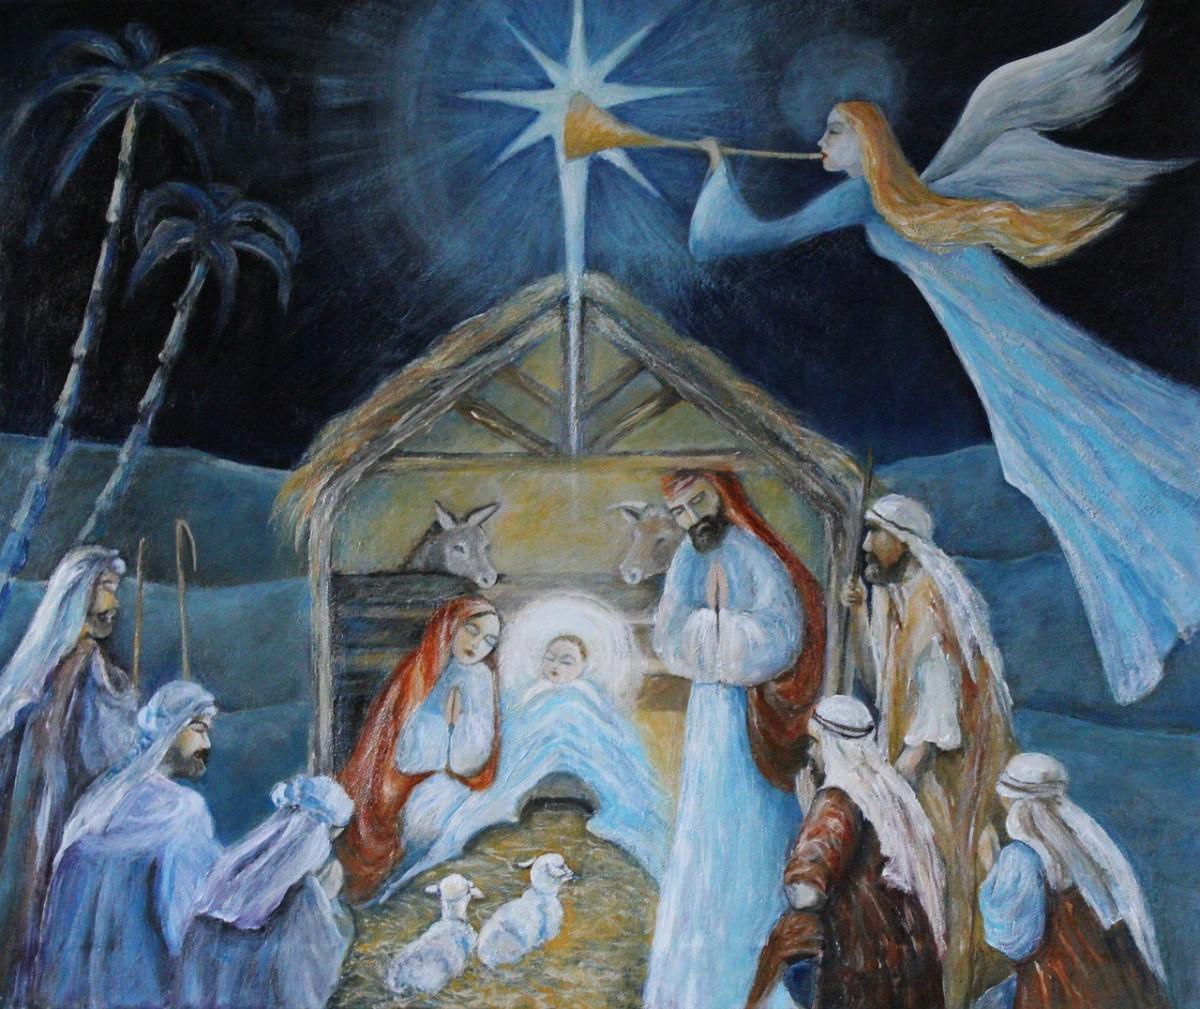 The Origin and Initial Purpose of Christmas